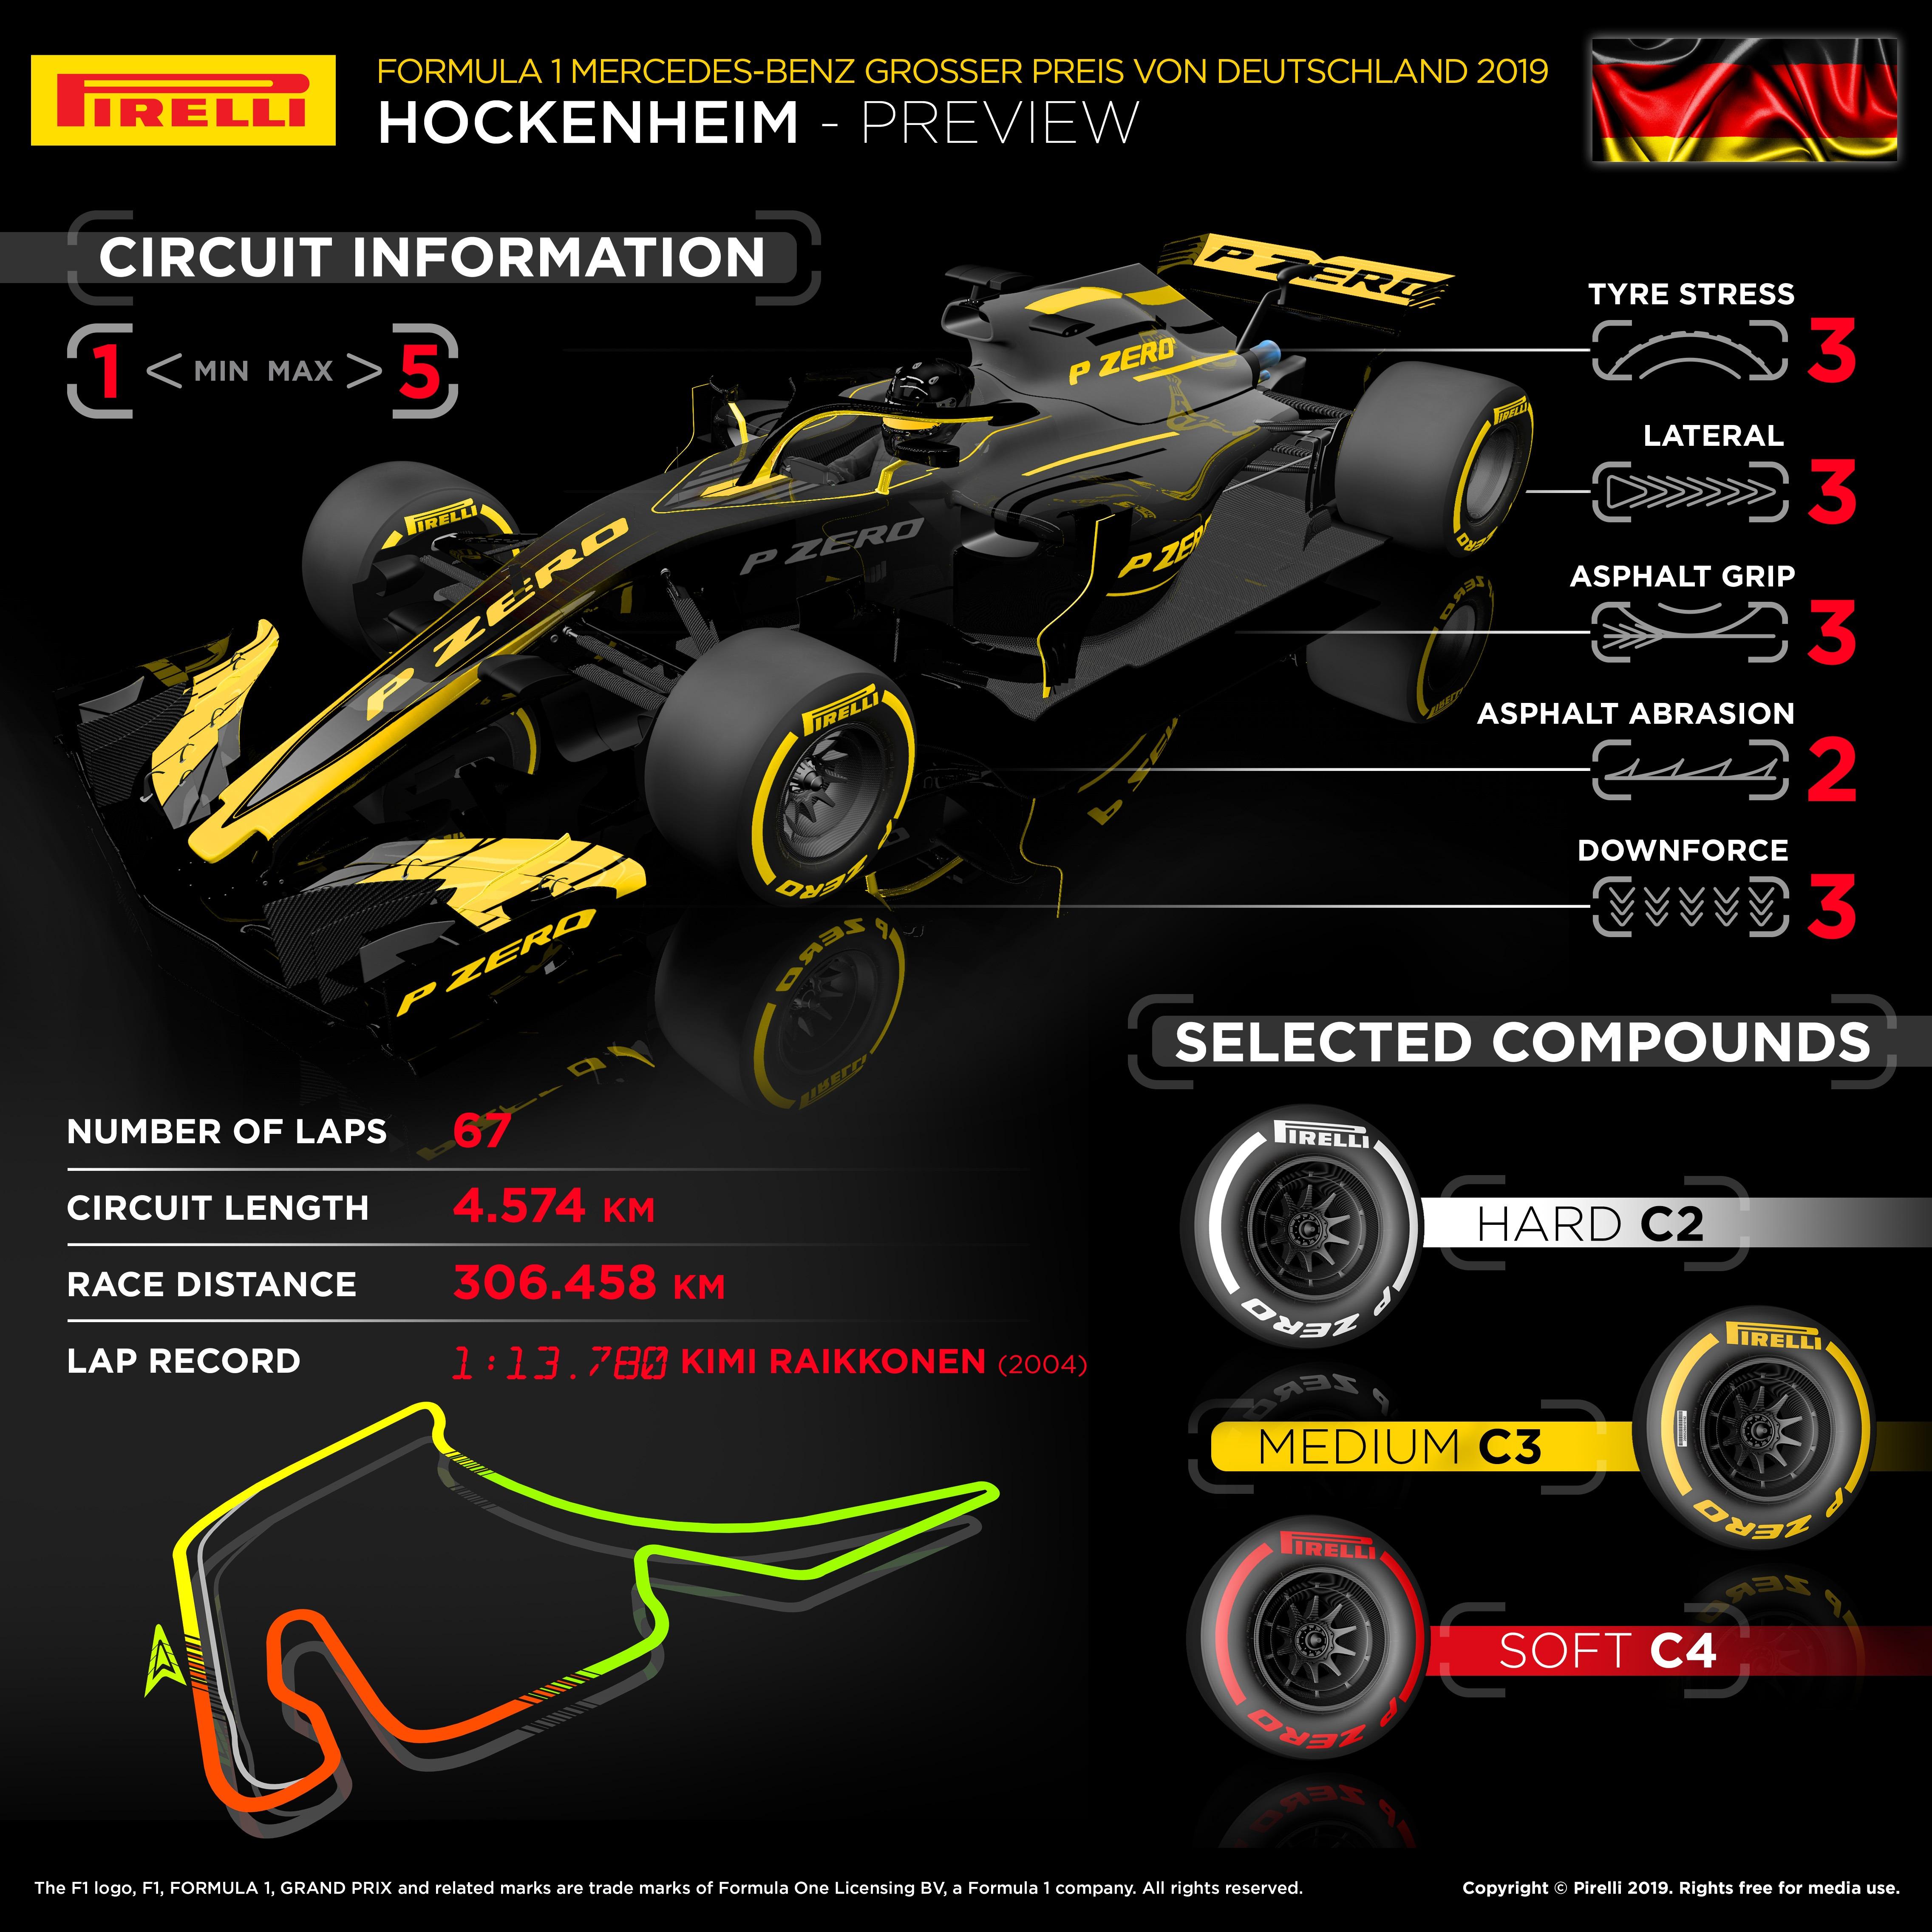 Infographic German F1 Grand Prix